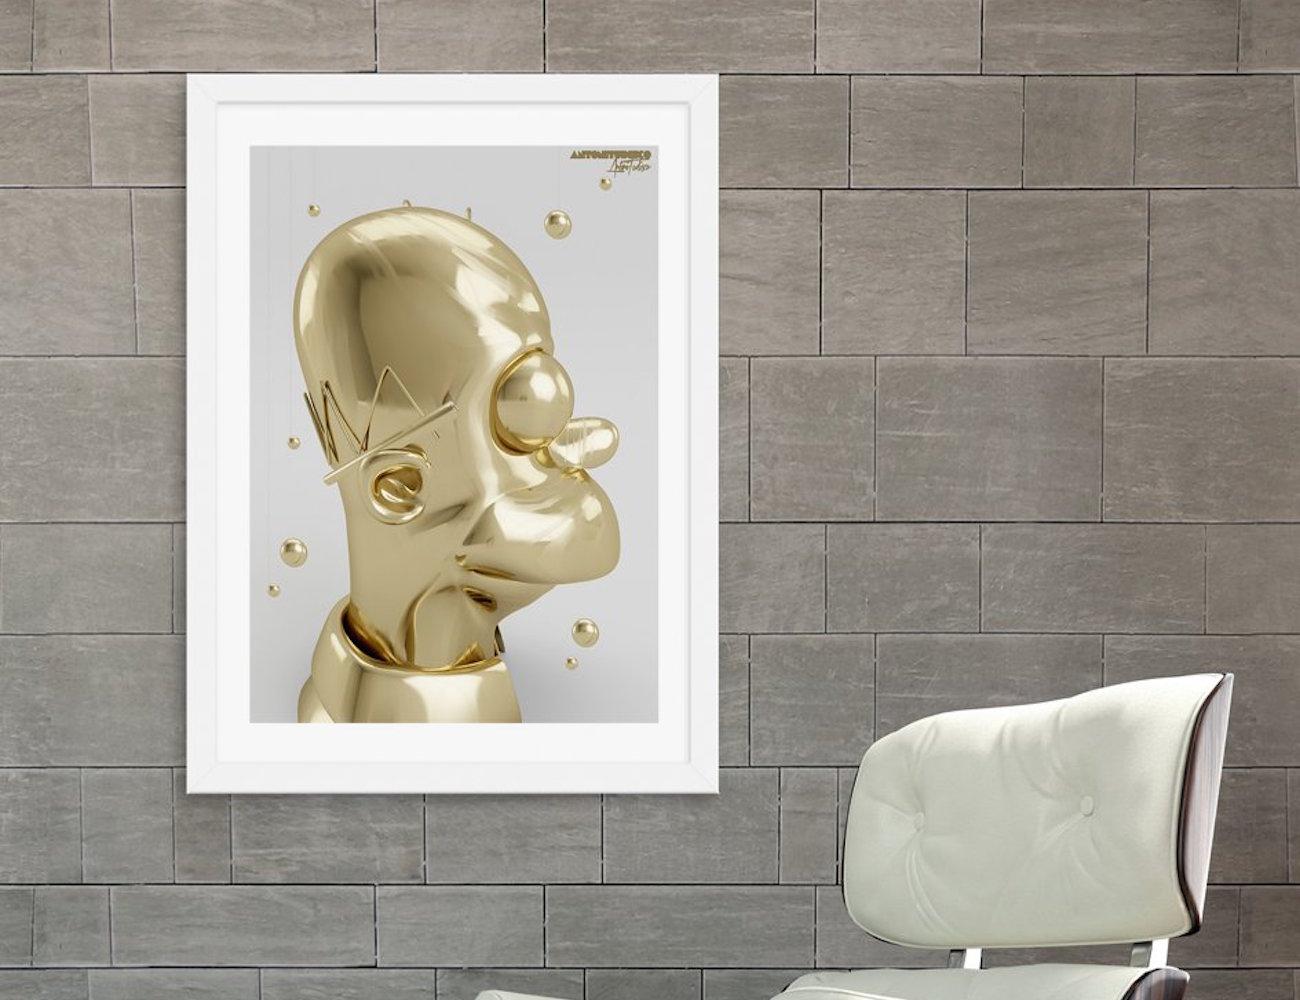 Golden Homer Print by Antoni Tudisco